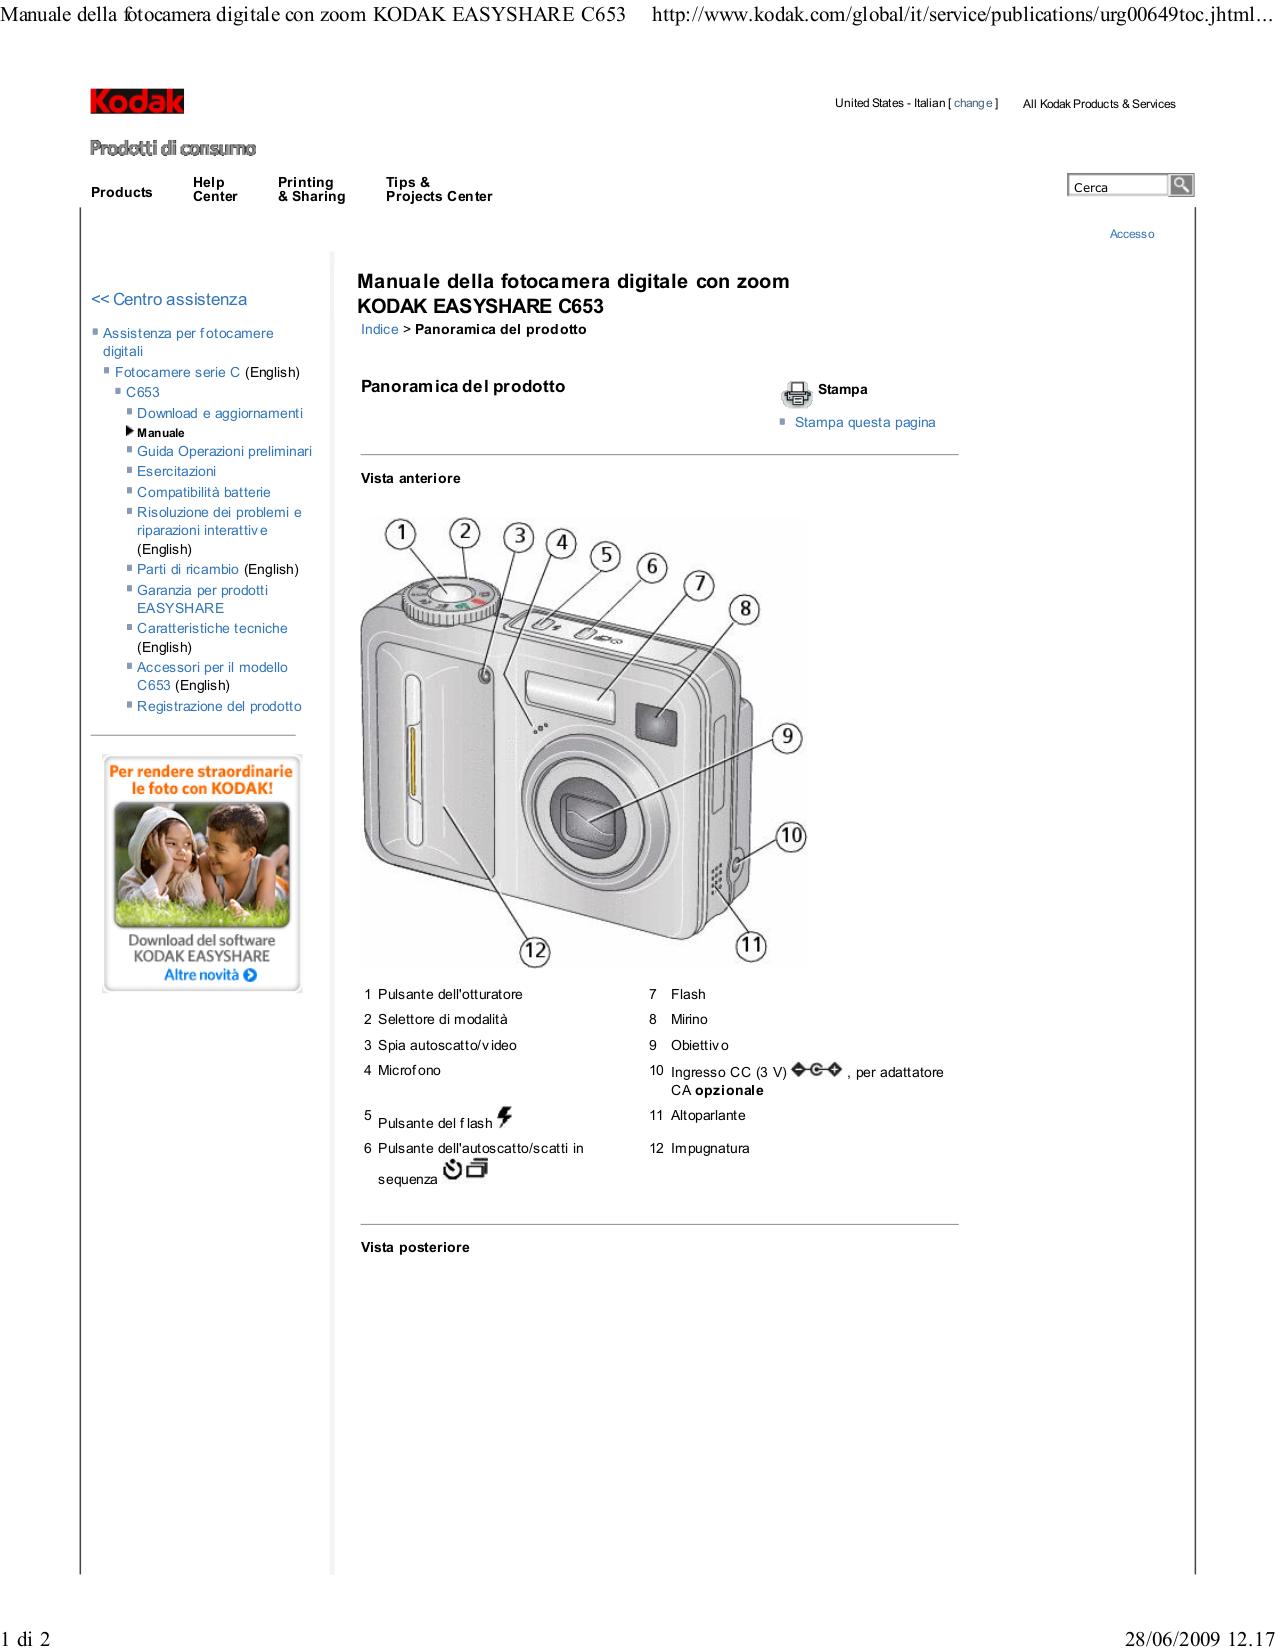 manual kodak c653 browse manual guides u2022 rh trufflefries co